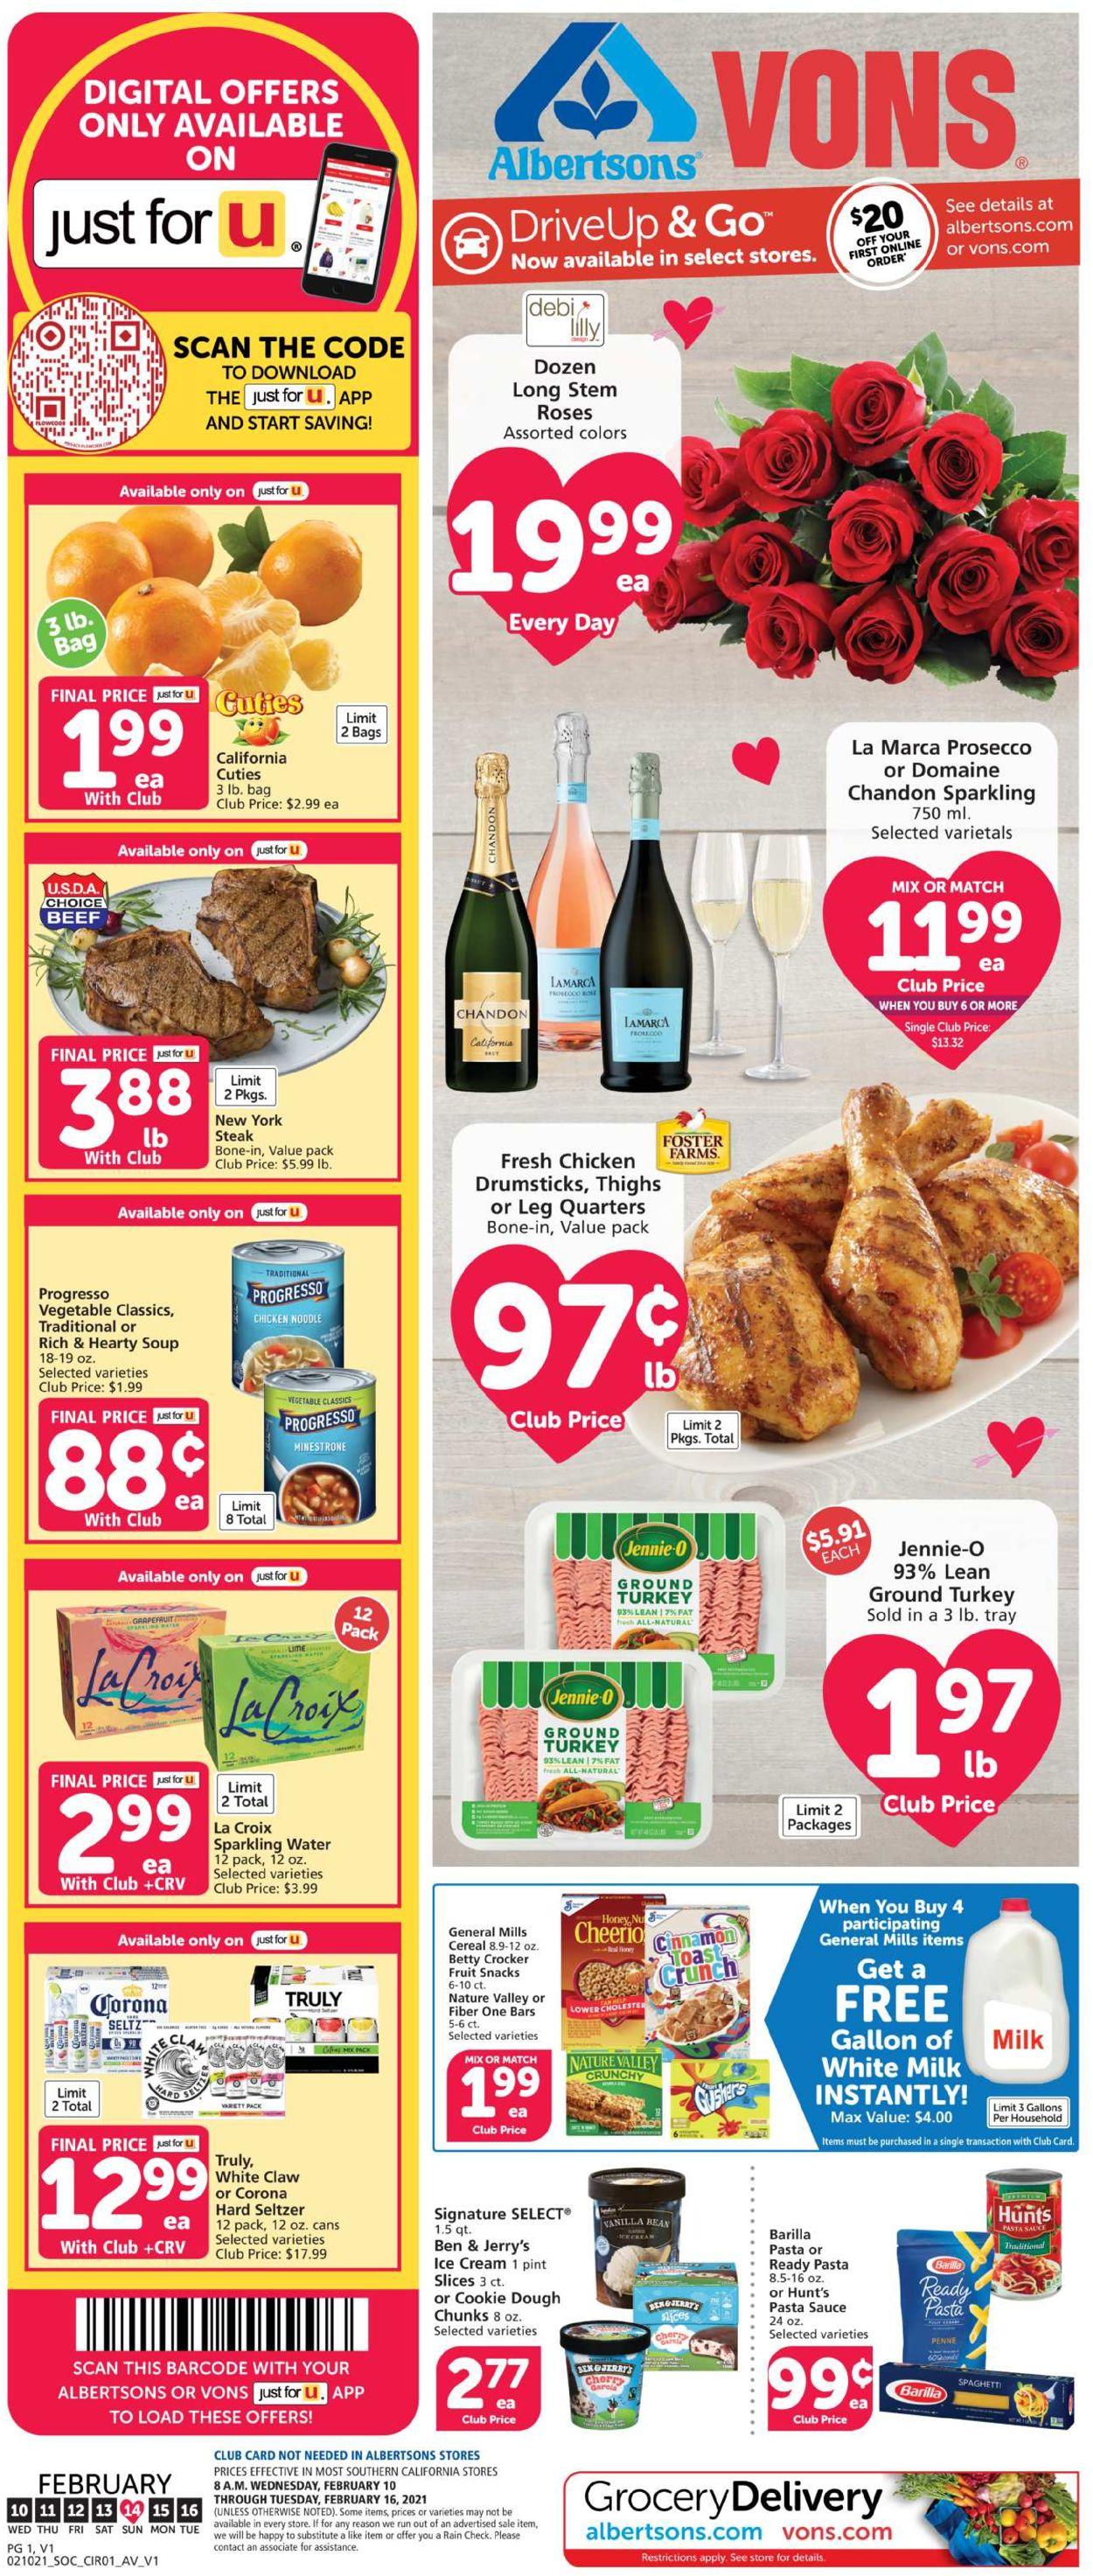 Vons Weekly Ad Circular - valid 02/10-02/16/2021